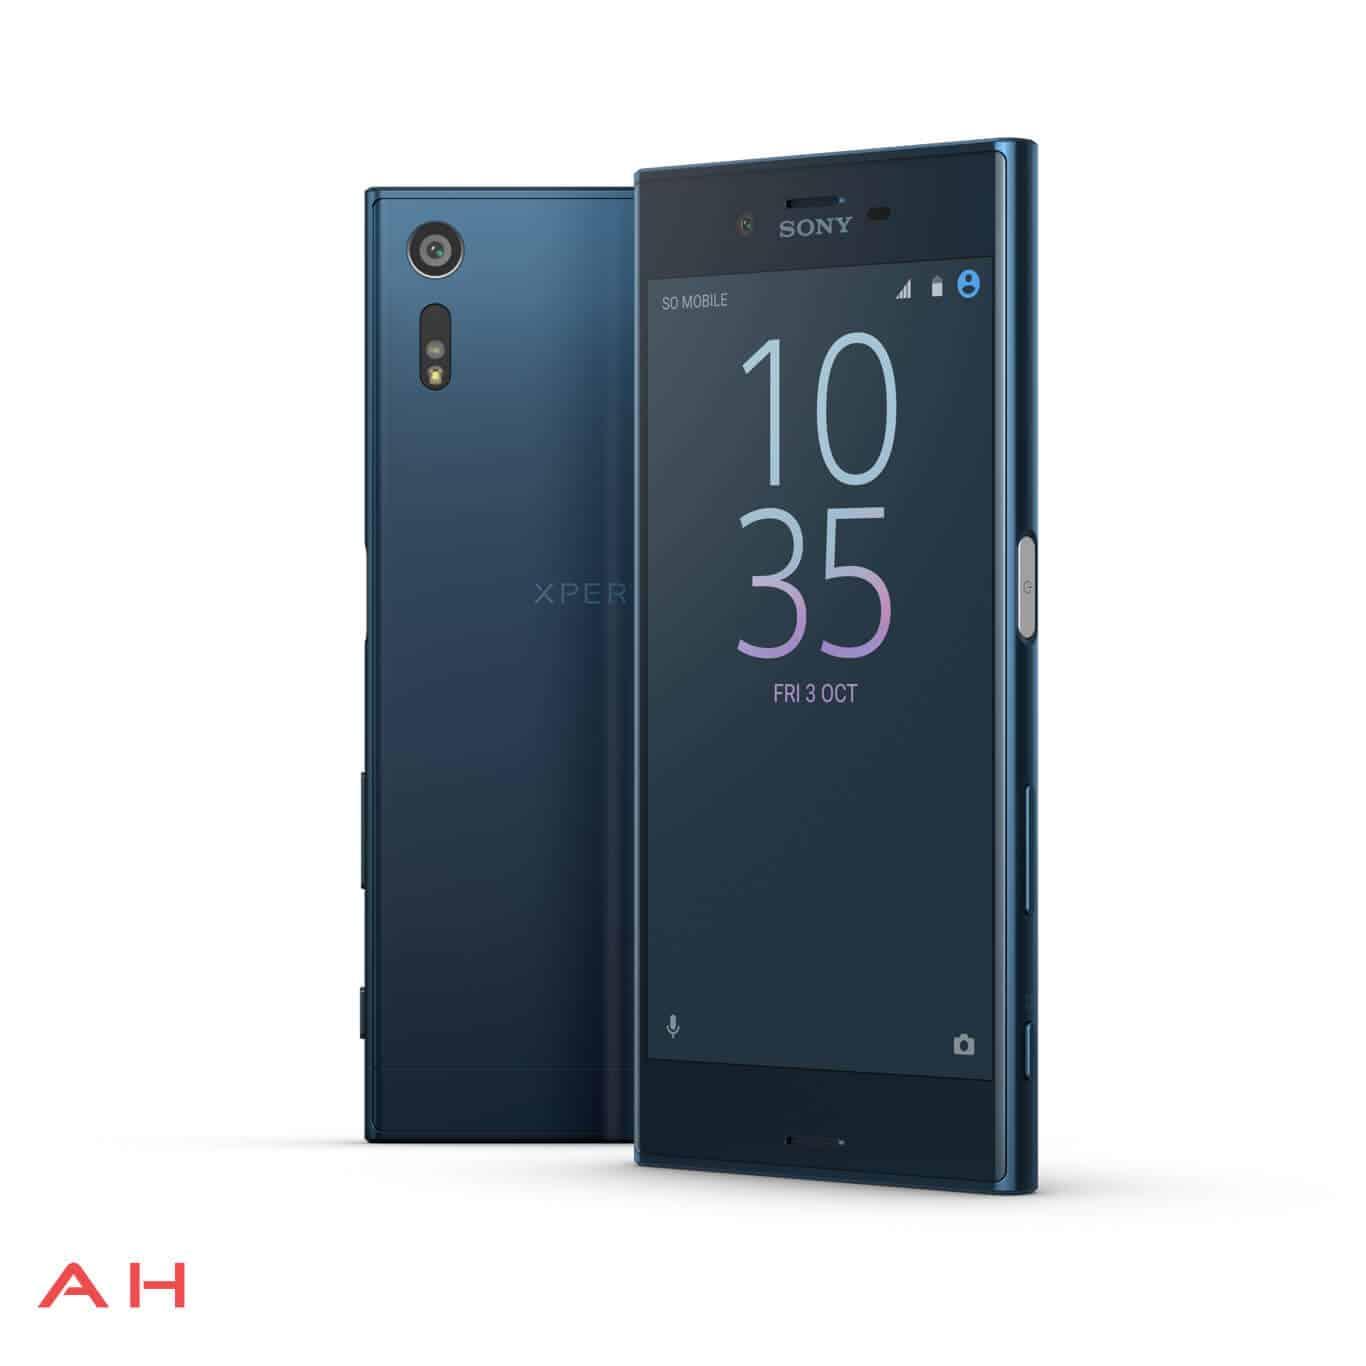 Sony Xperia XZ AH 8